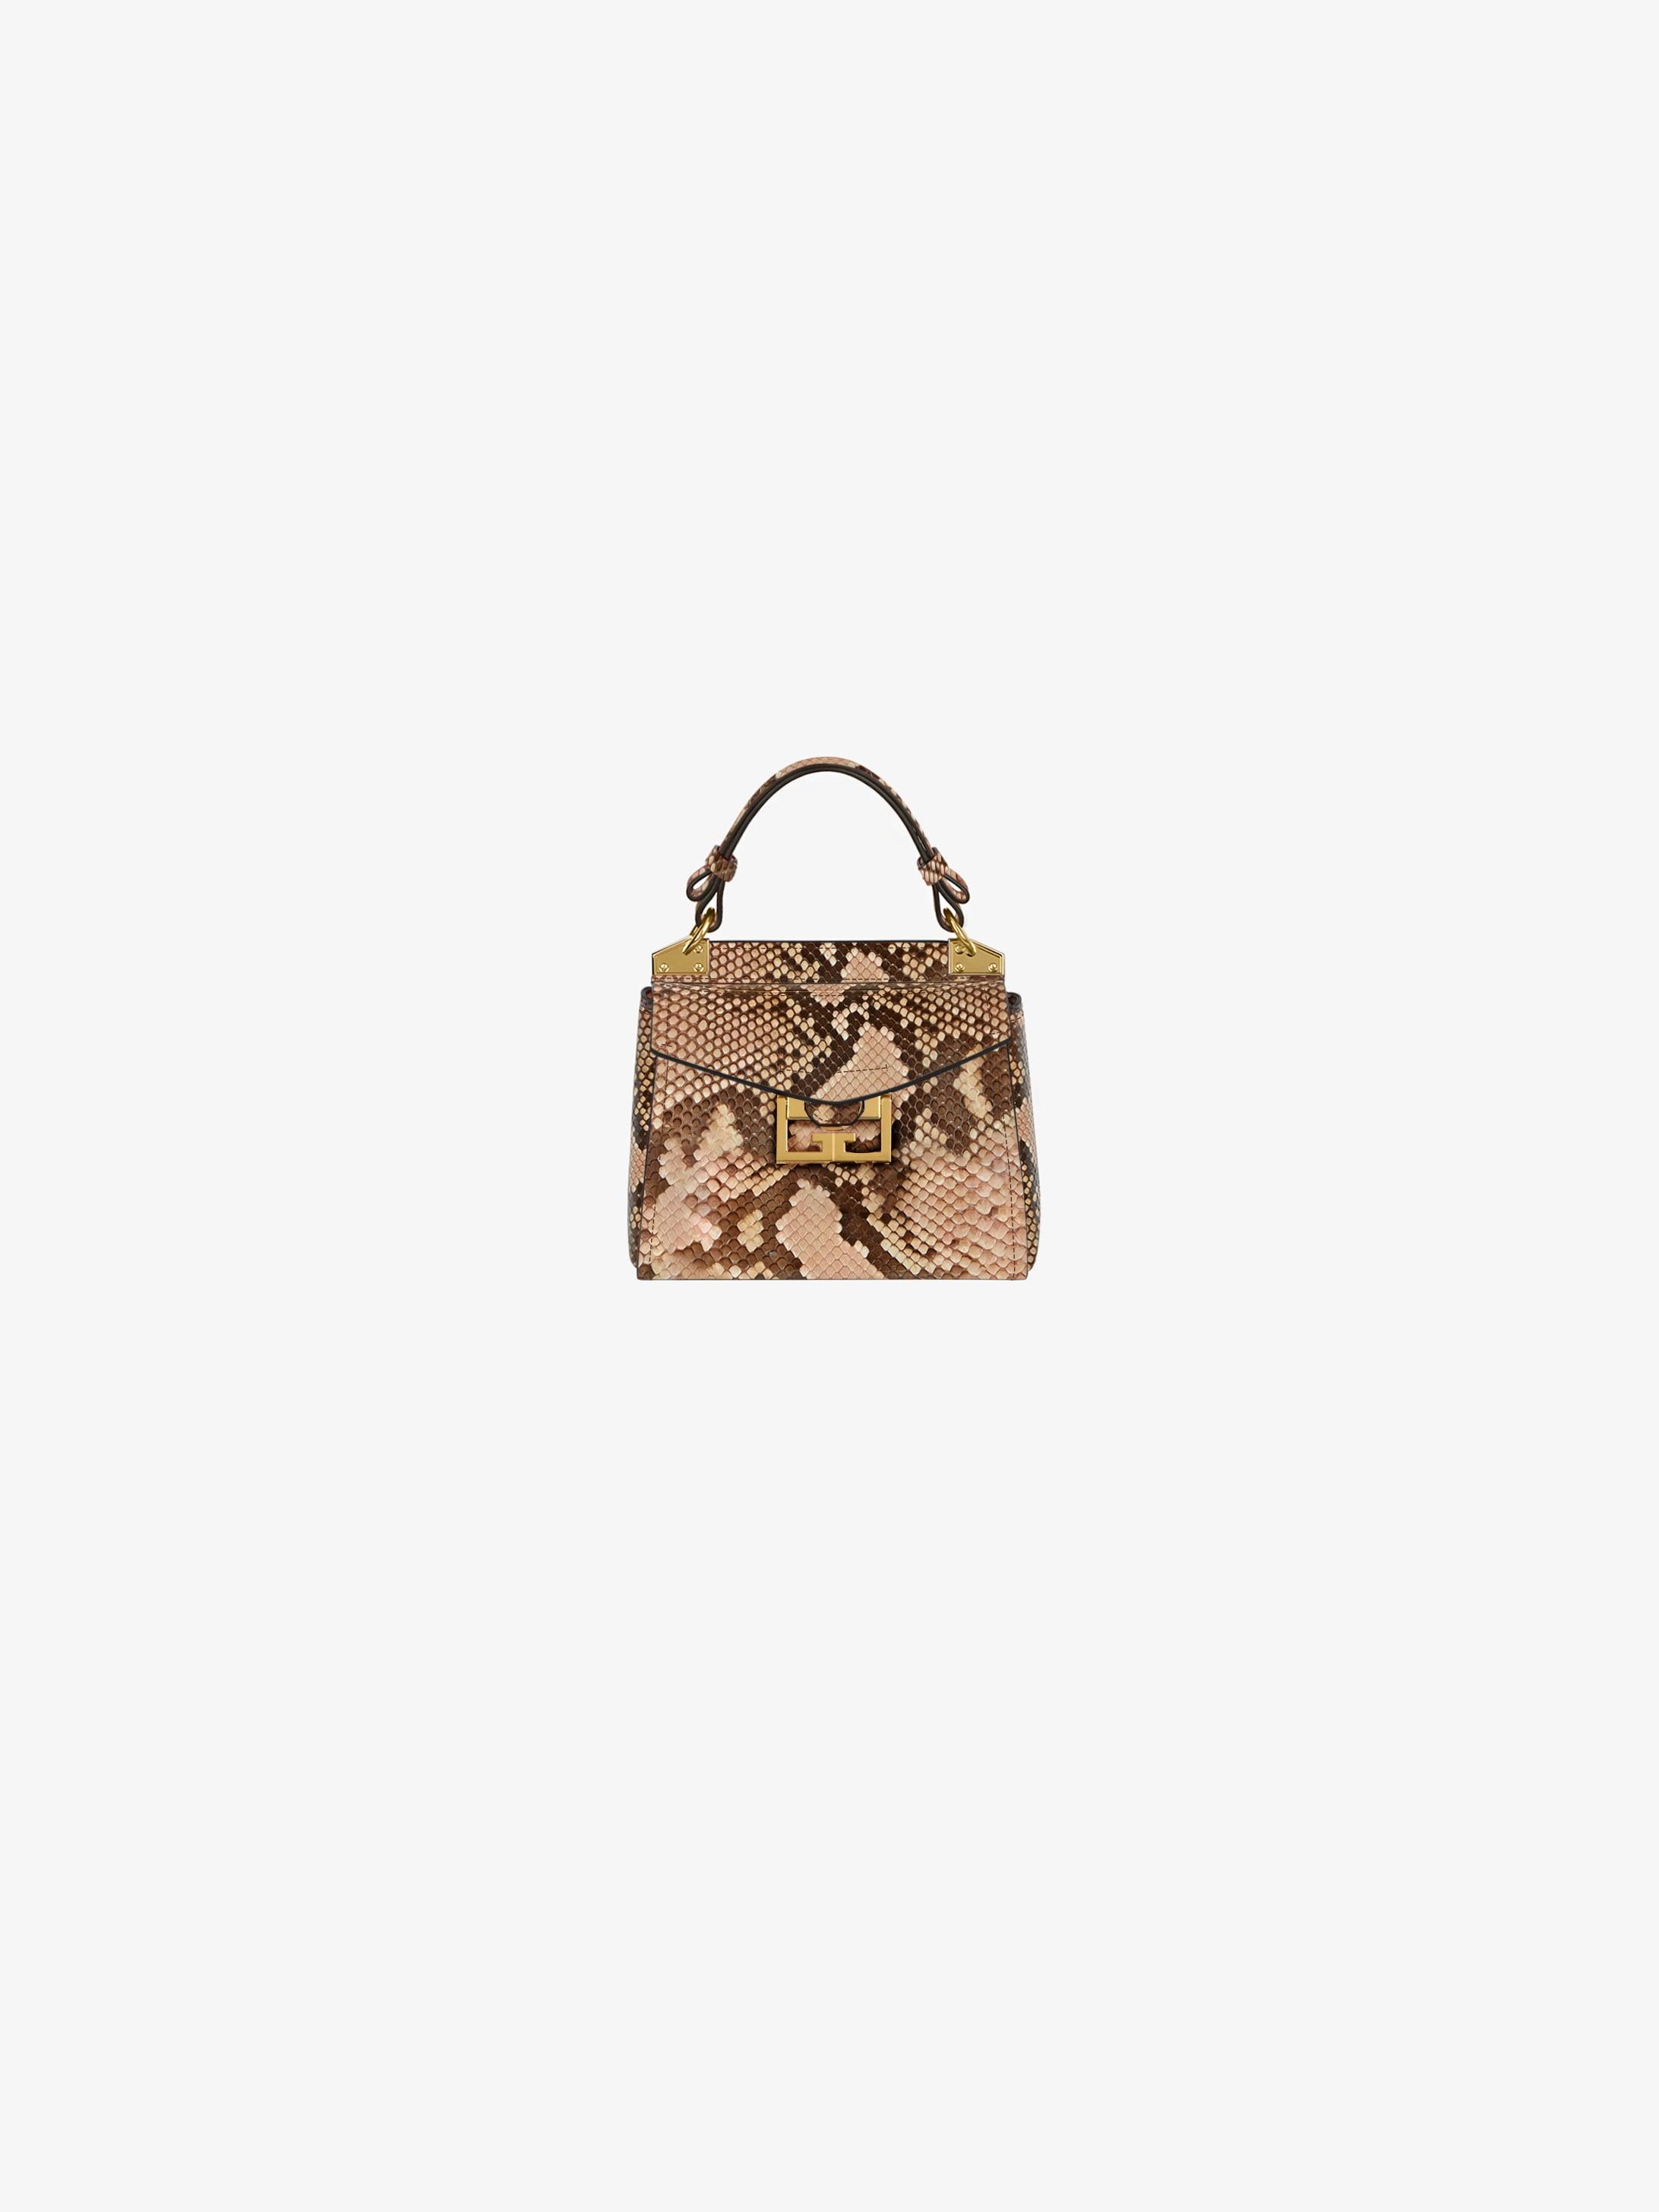 Mini Mystic bag in faded effect python skin